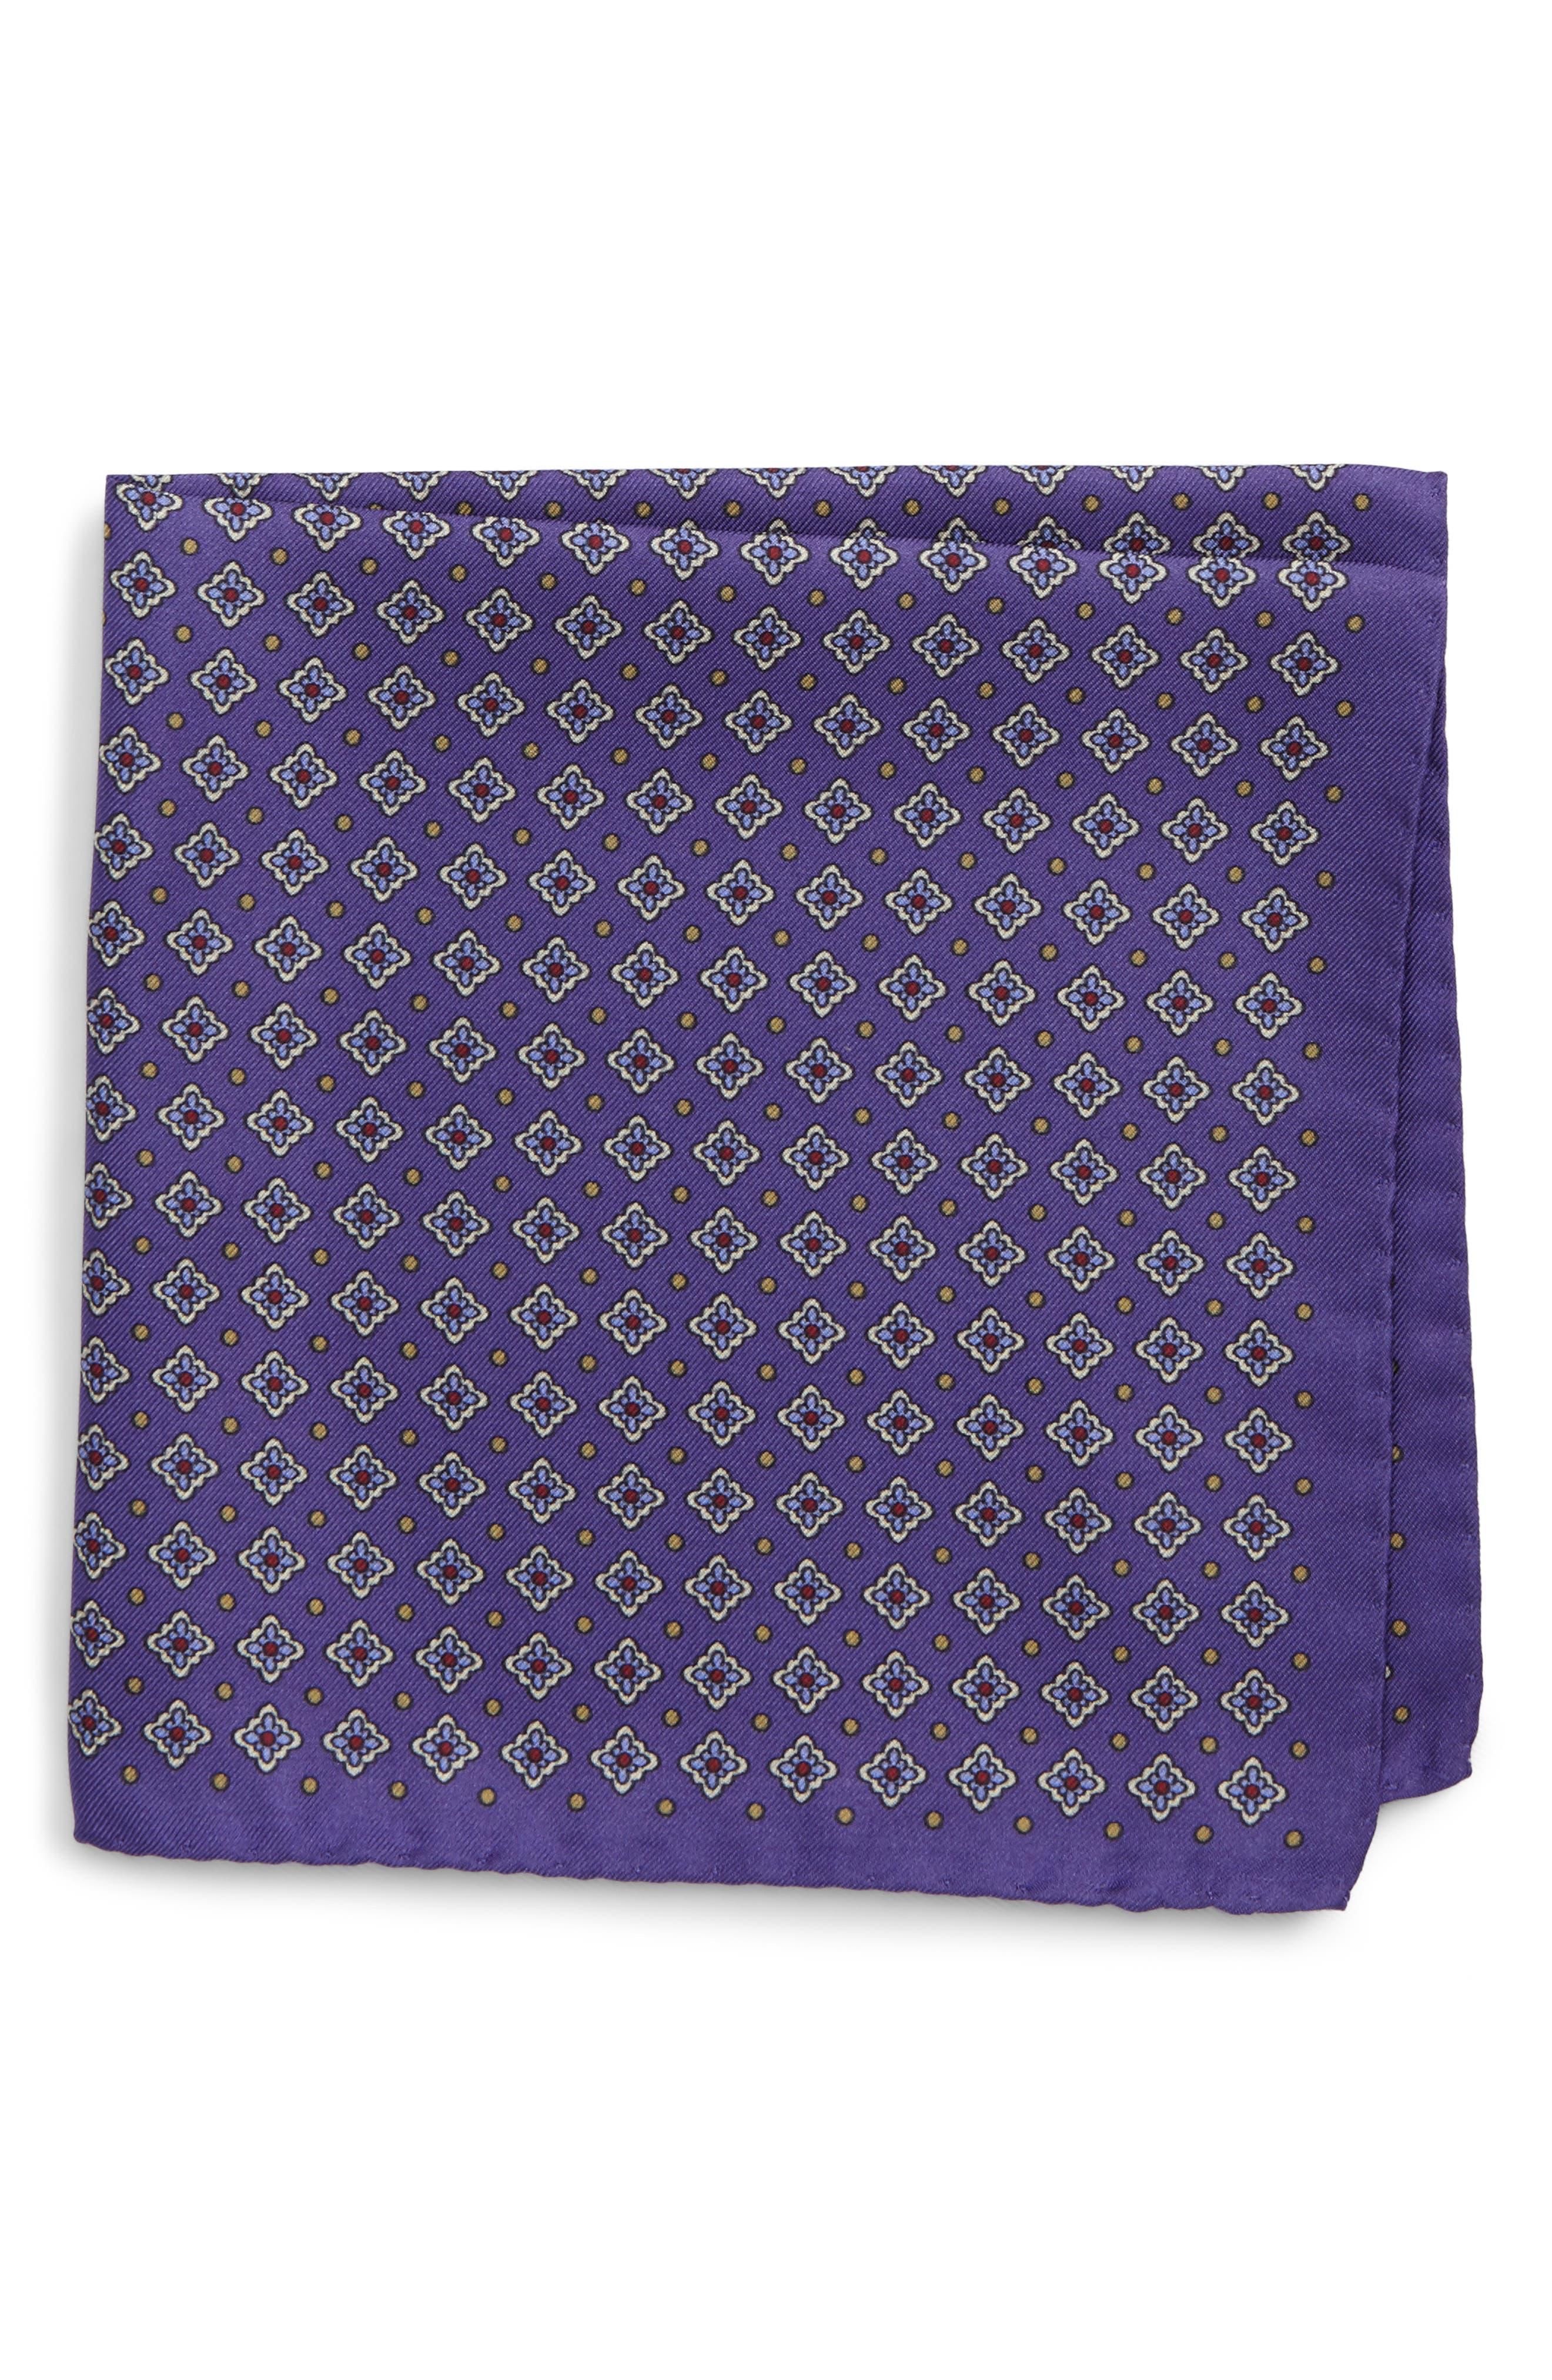 Main Image - Eton Medallion Silk Pocket Square